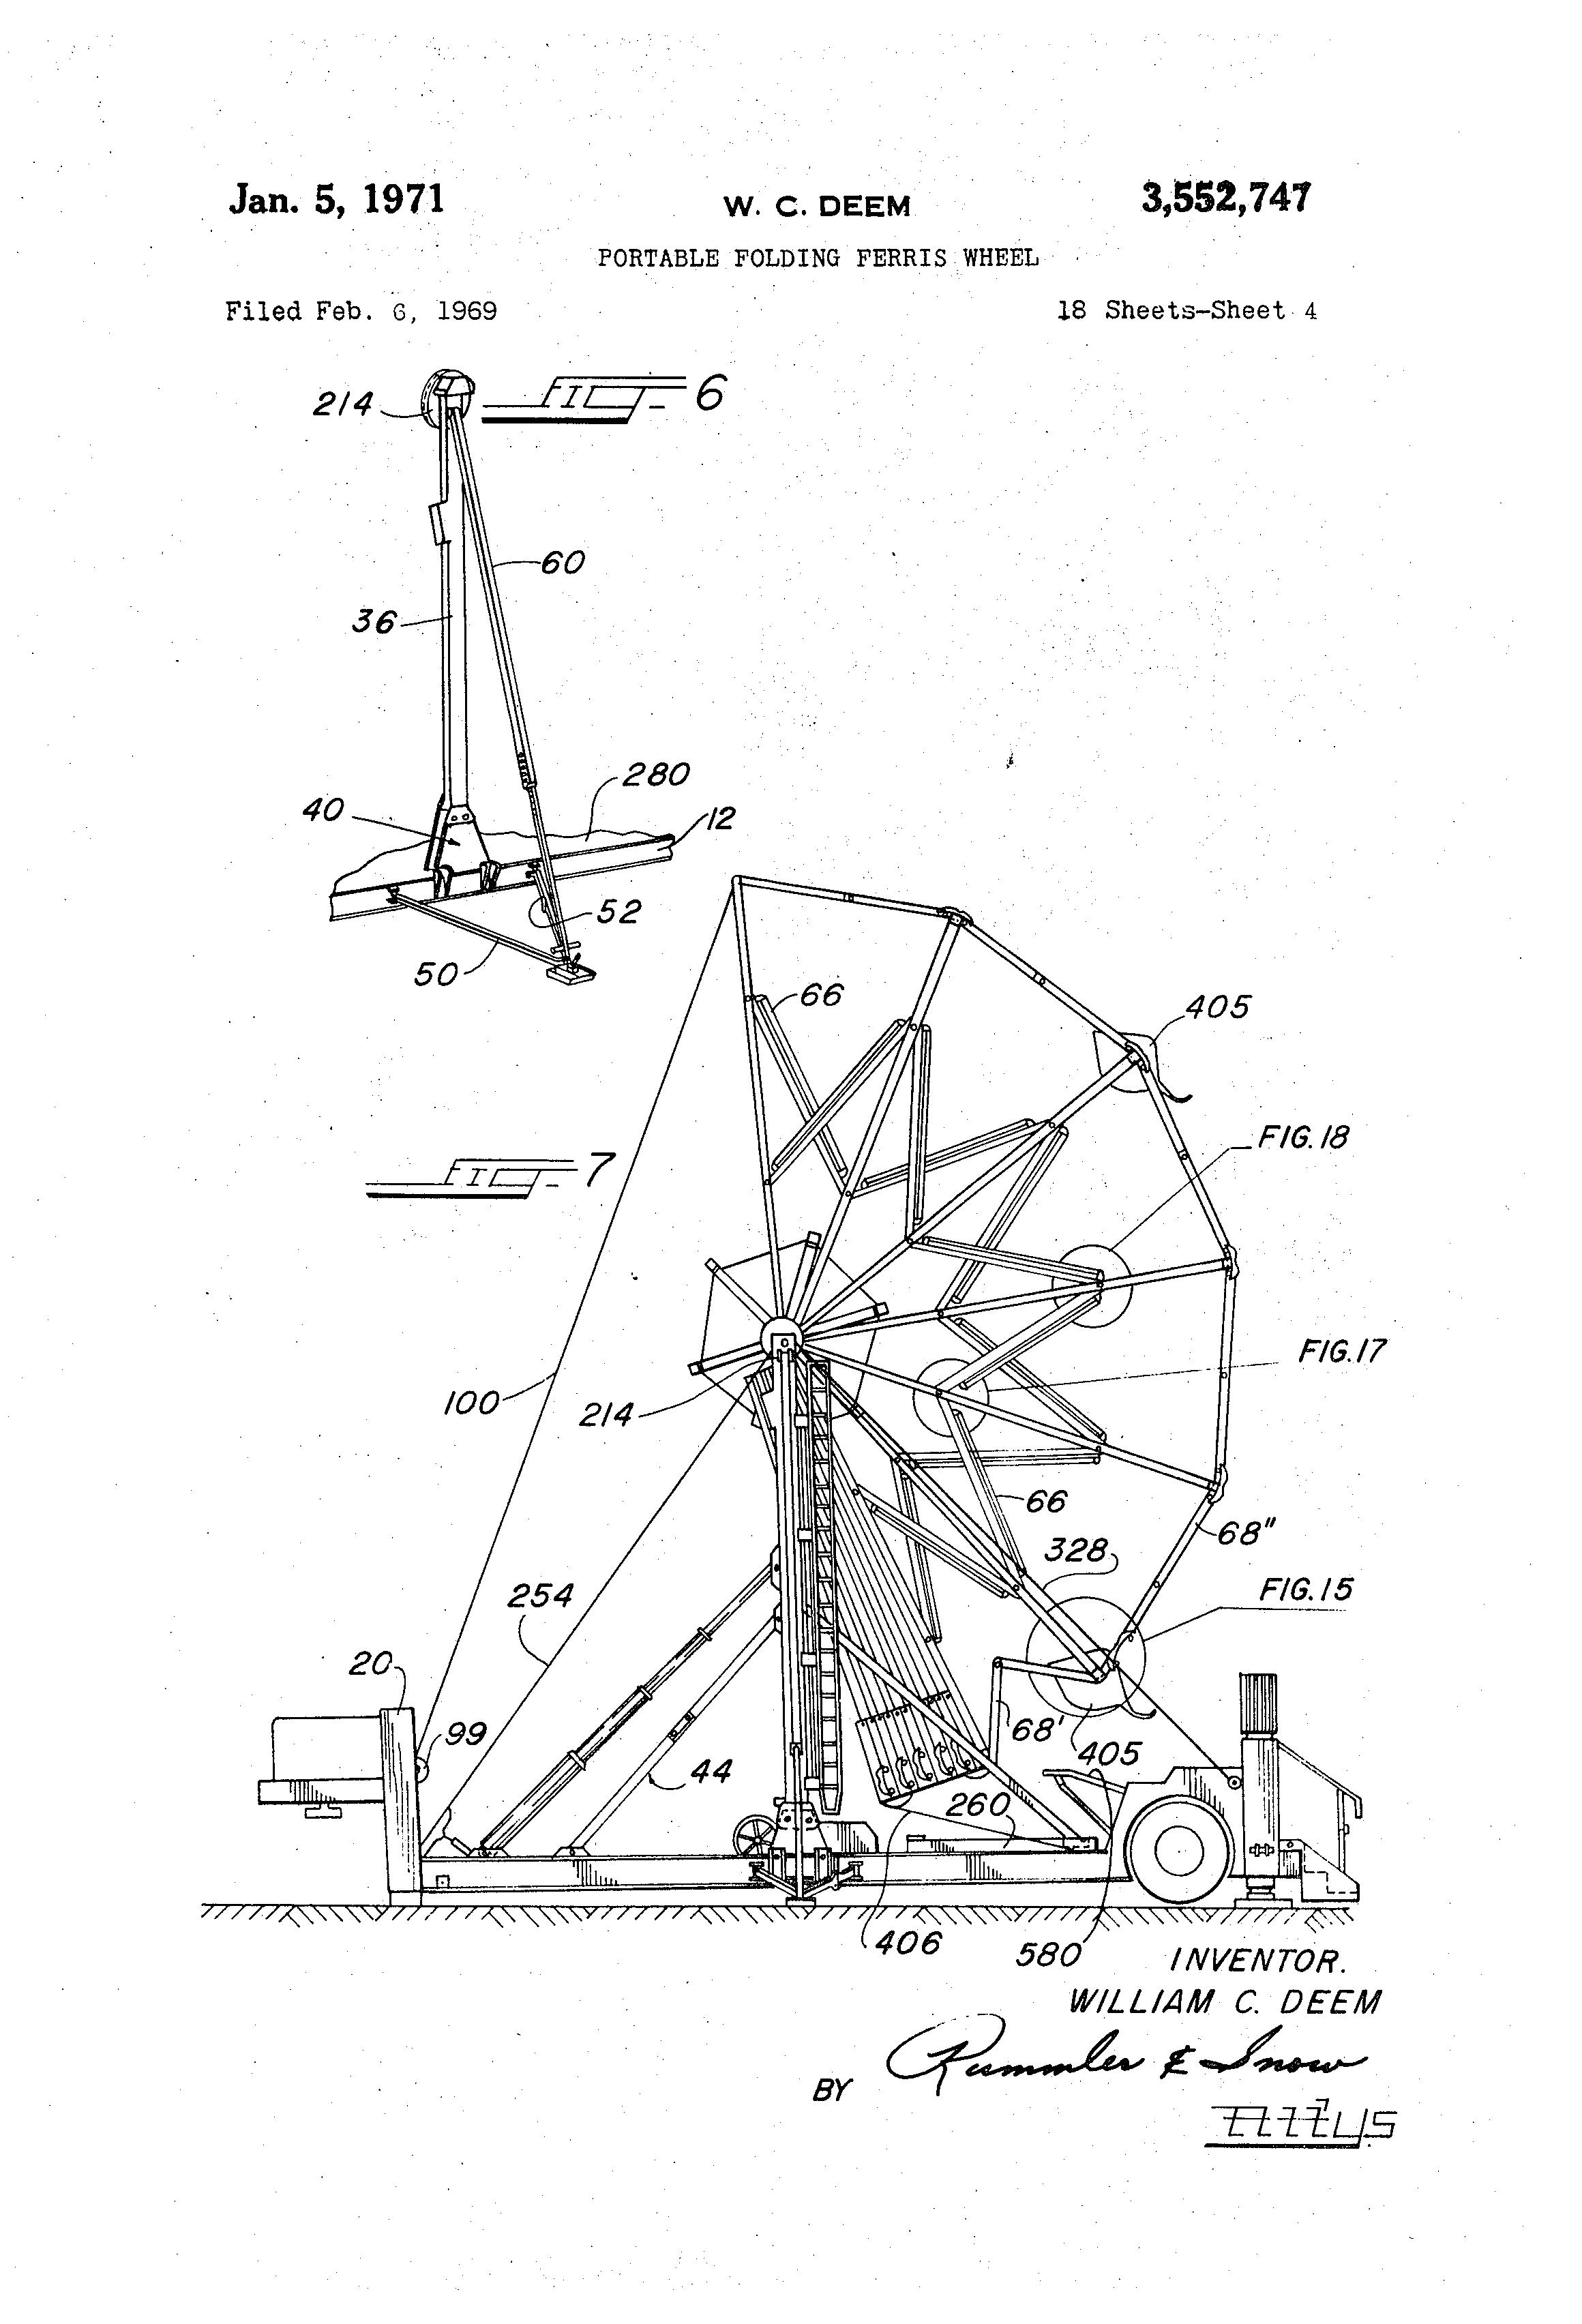 Drawn ferris wheel eli #14